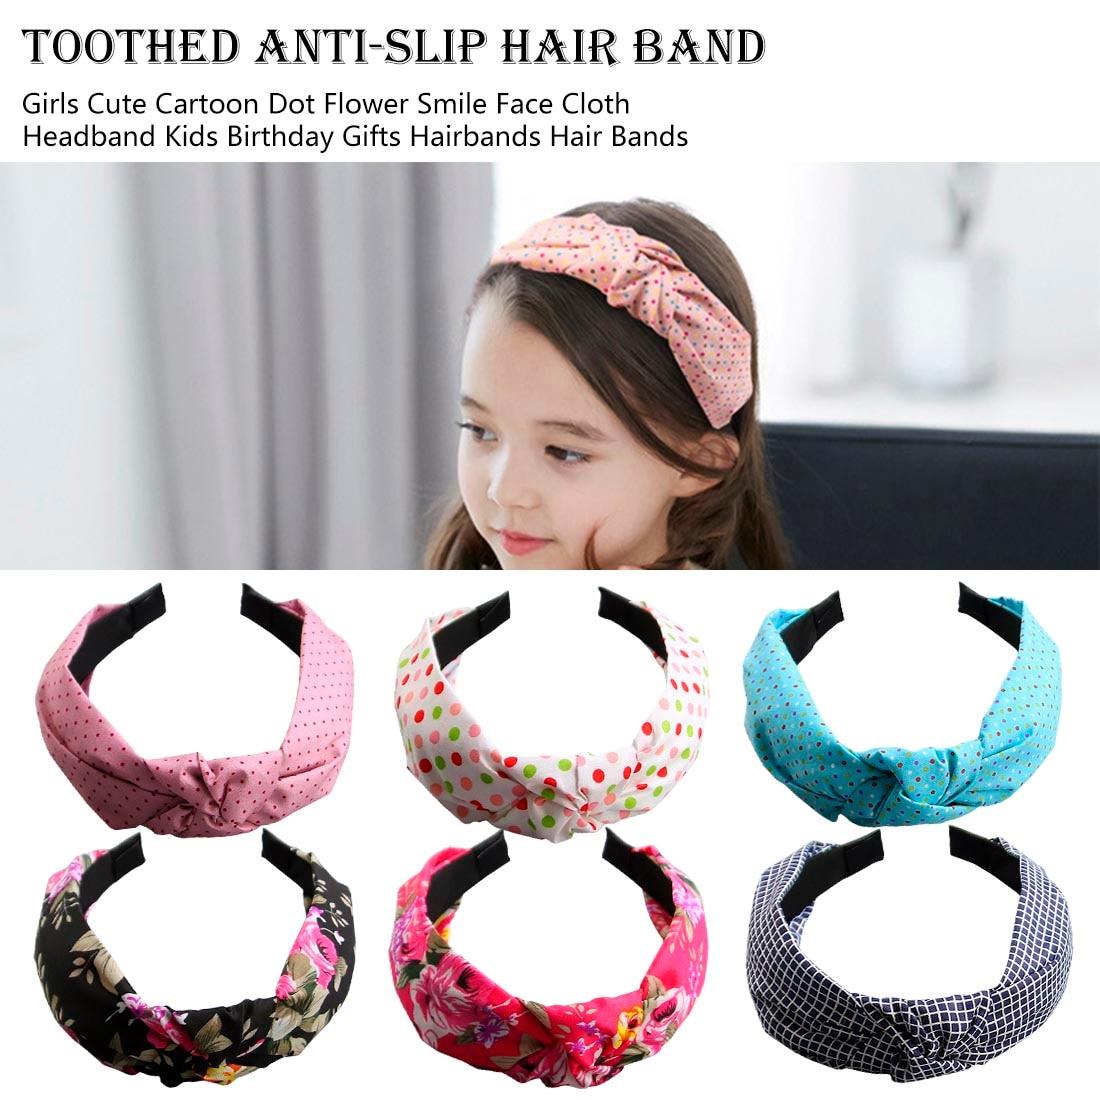 Bohemia Style Hairband Top Knot Turban Vintage Elastic Hair Head Hoop Bands Accessories Headband For Women Girls Print Headdress